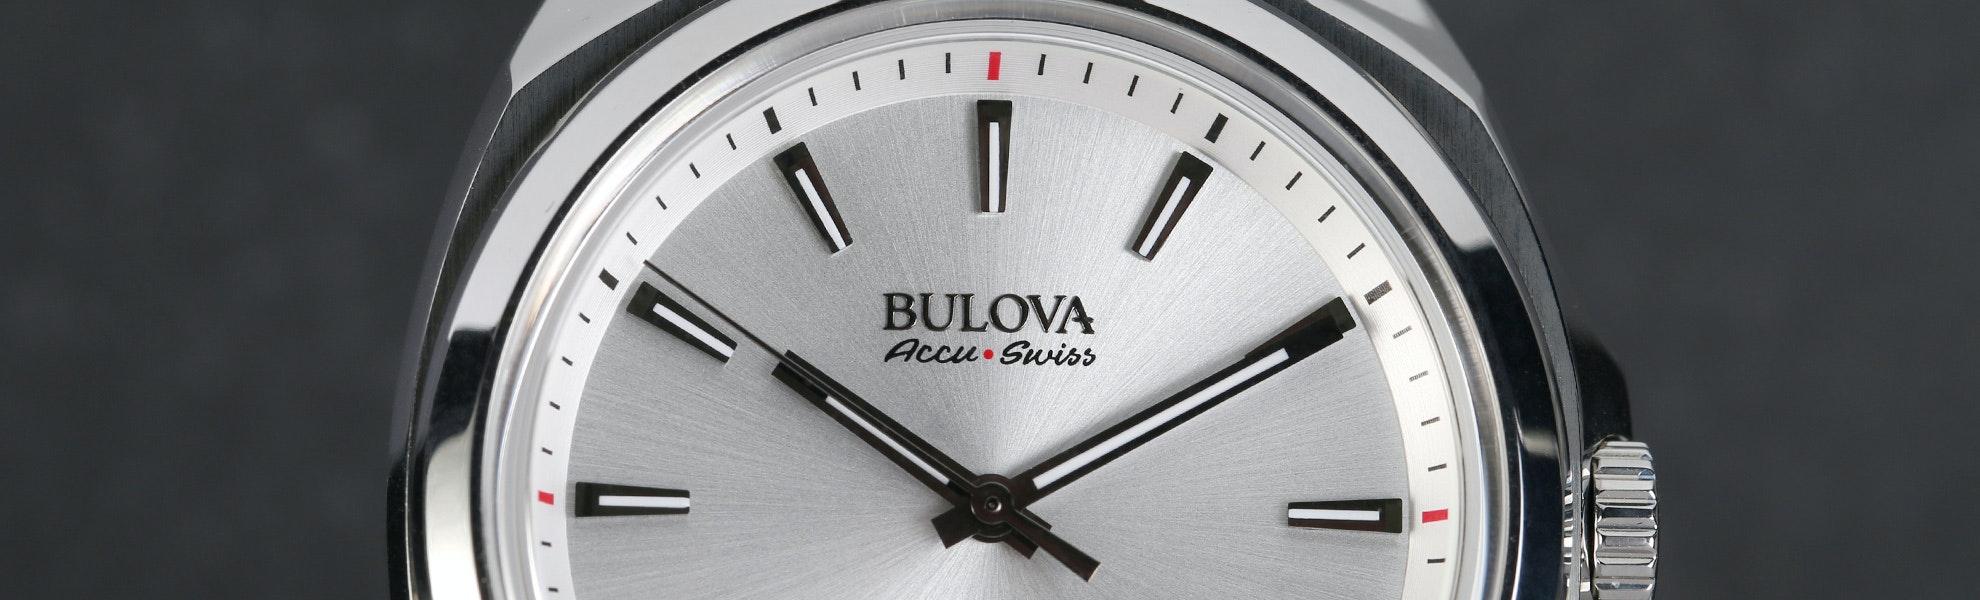 Bulova AccuSwiss Telc Watch